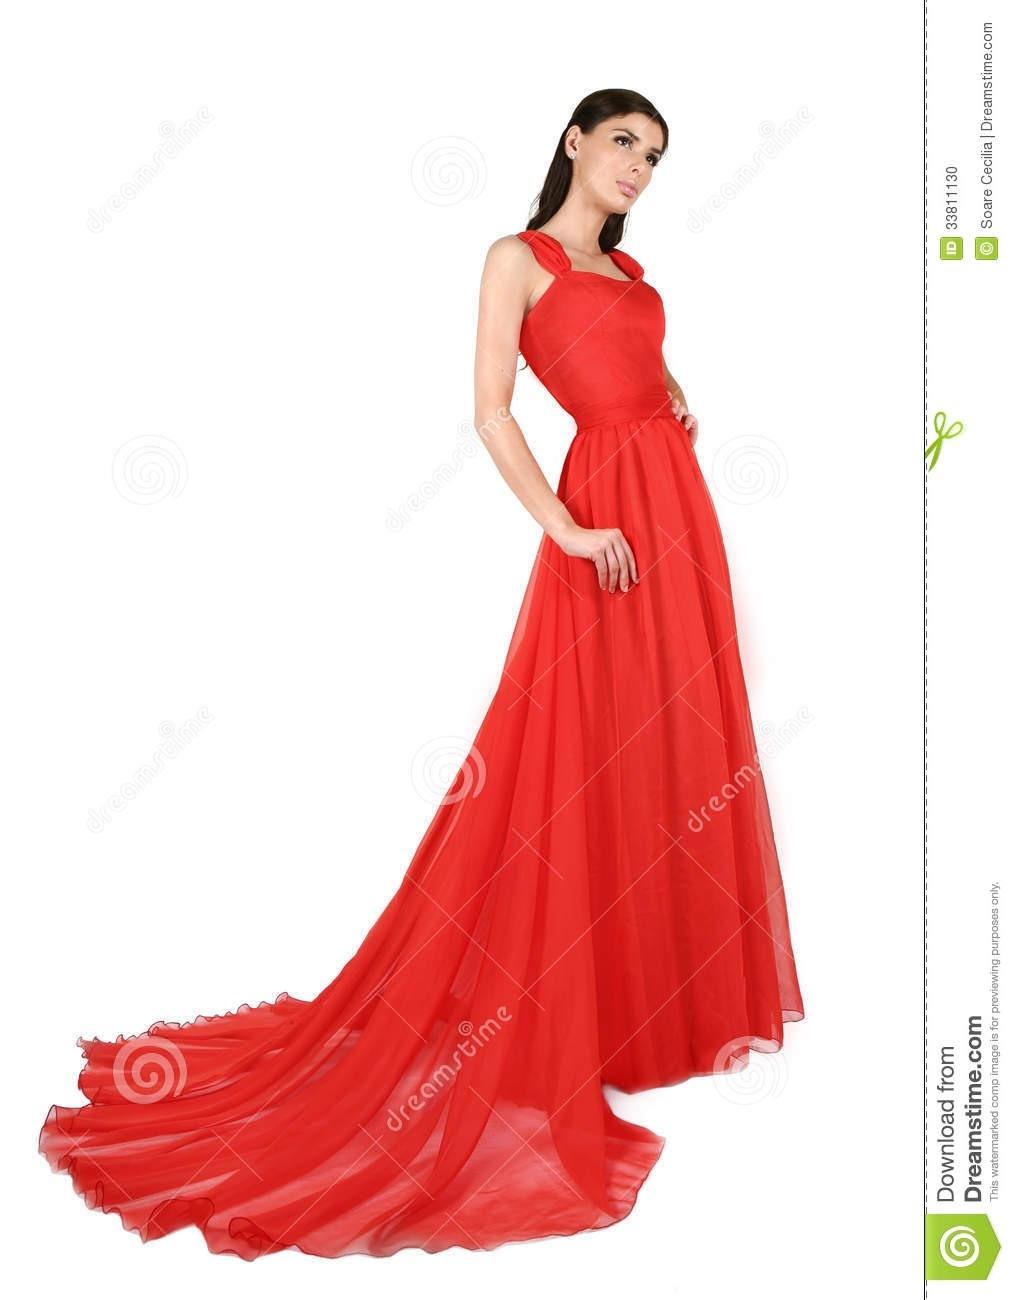 Formal Schön Rotes Abendkleid GalerieDesigner Kreativ Rotes Abendkleid Boutique